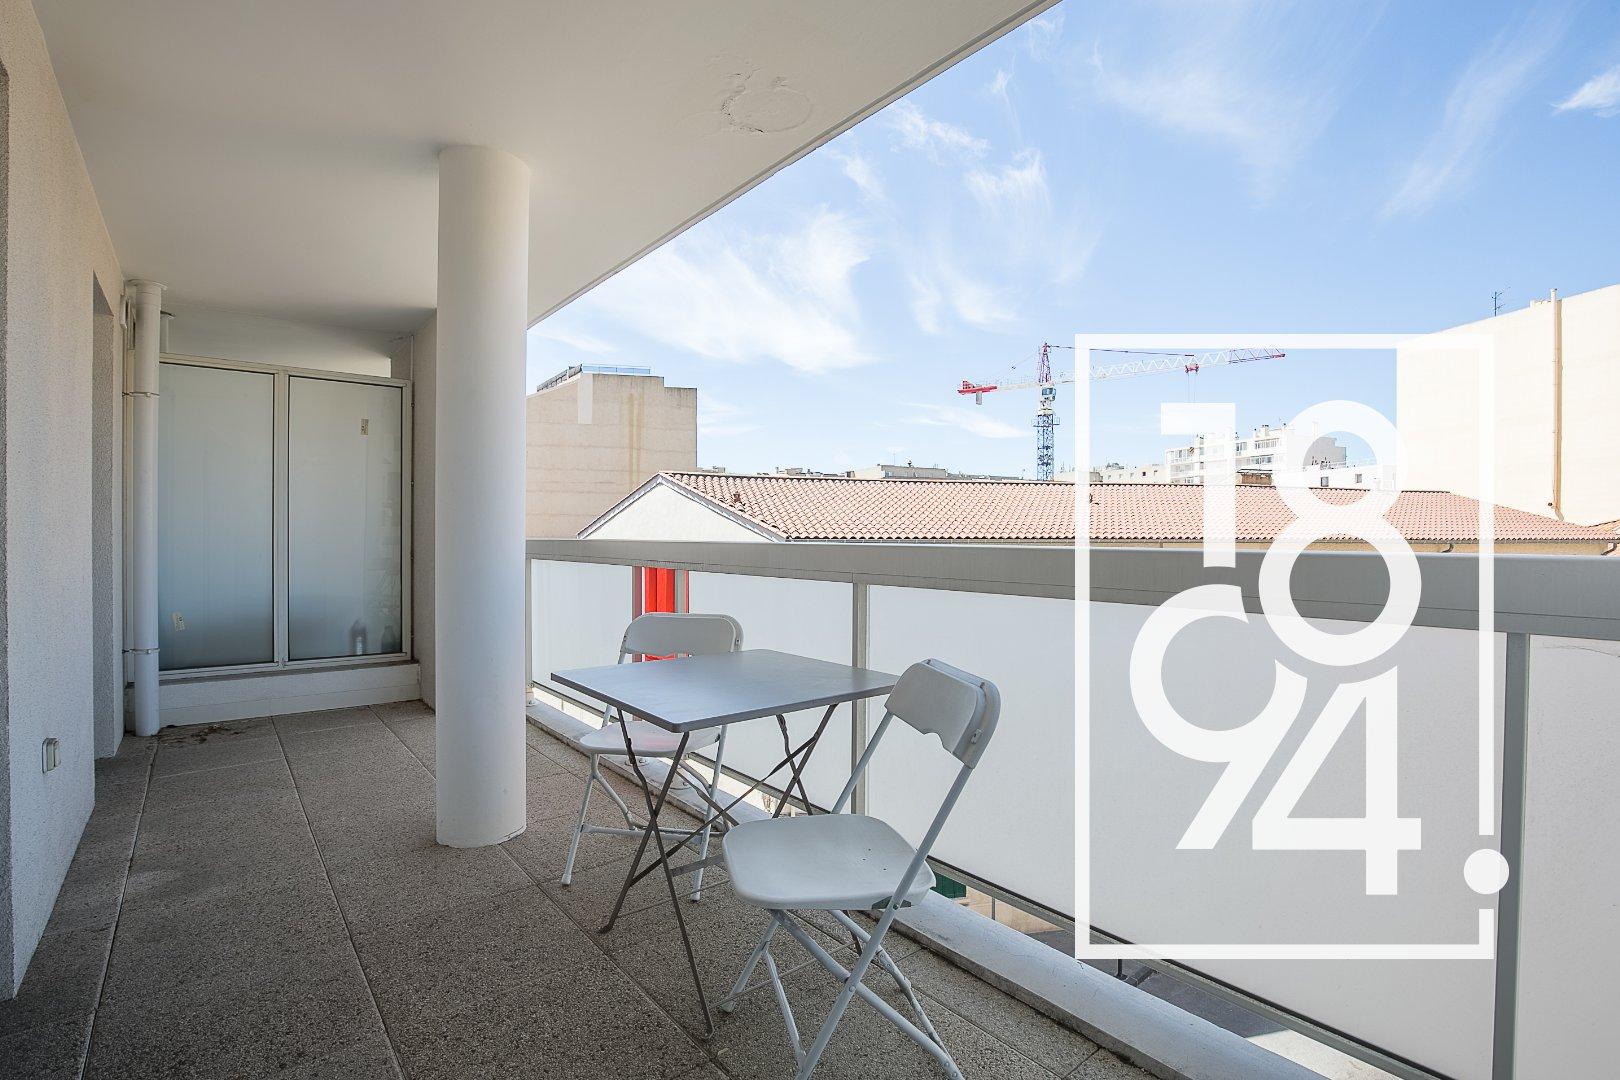 Appartement T2 40 m2 terrasse ROUET/PRADO